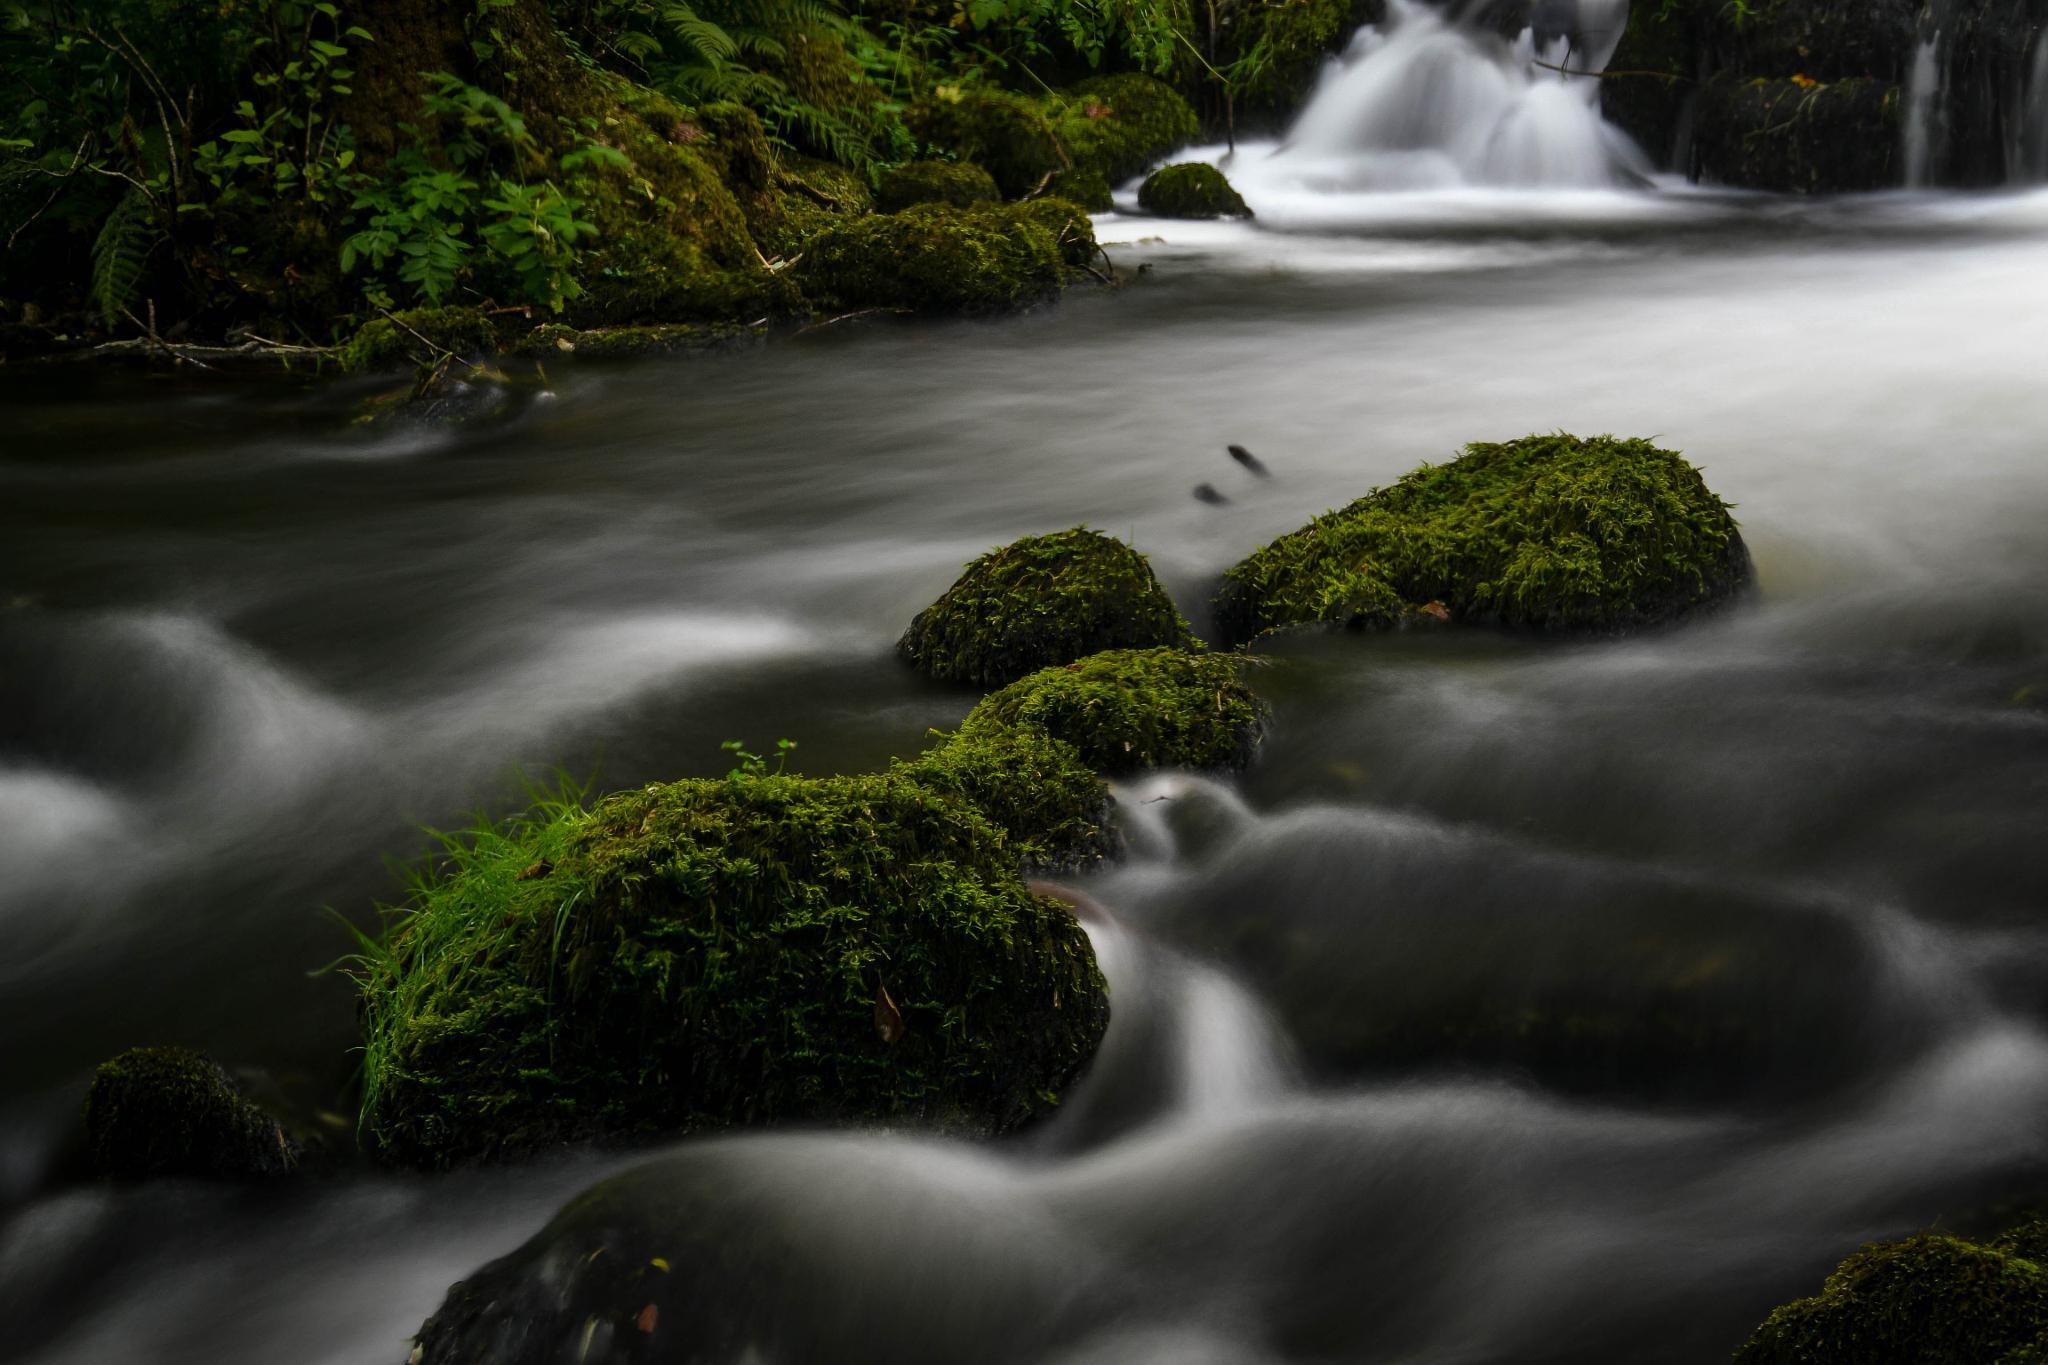 Rushing River by MjollnirMacAlba